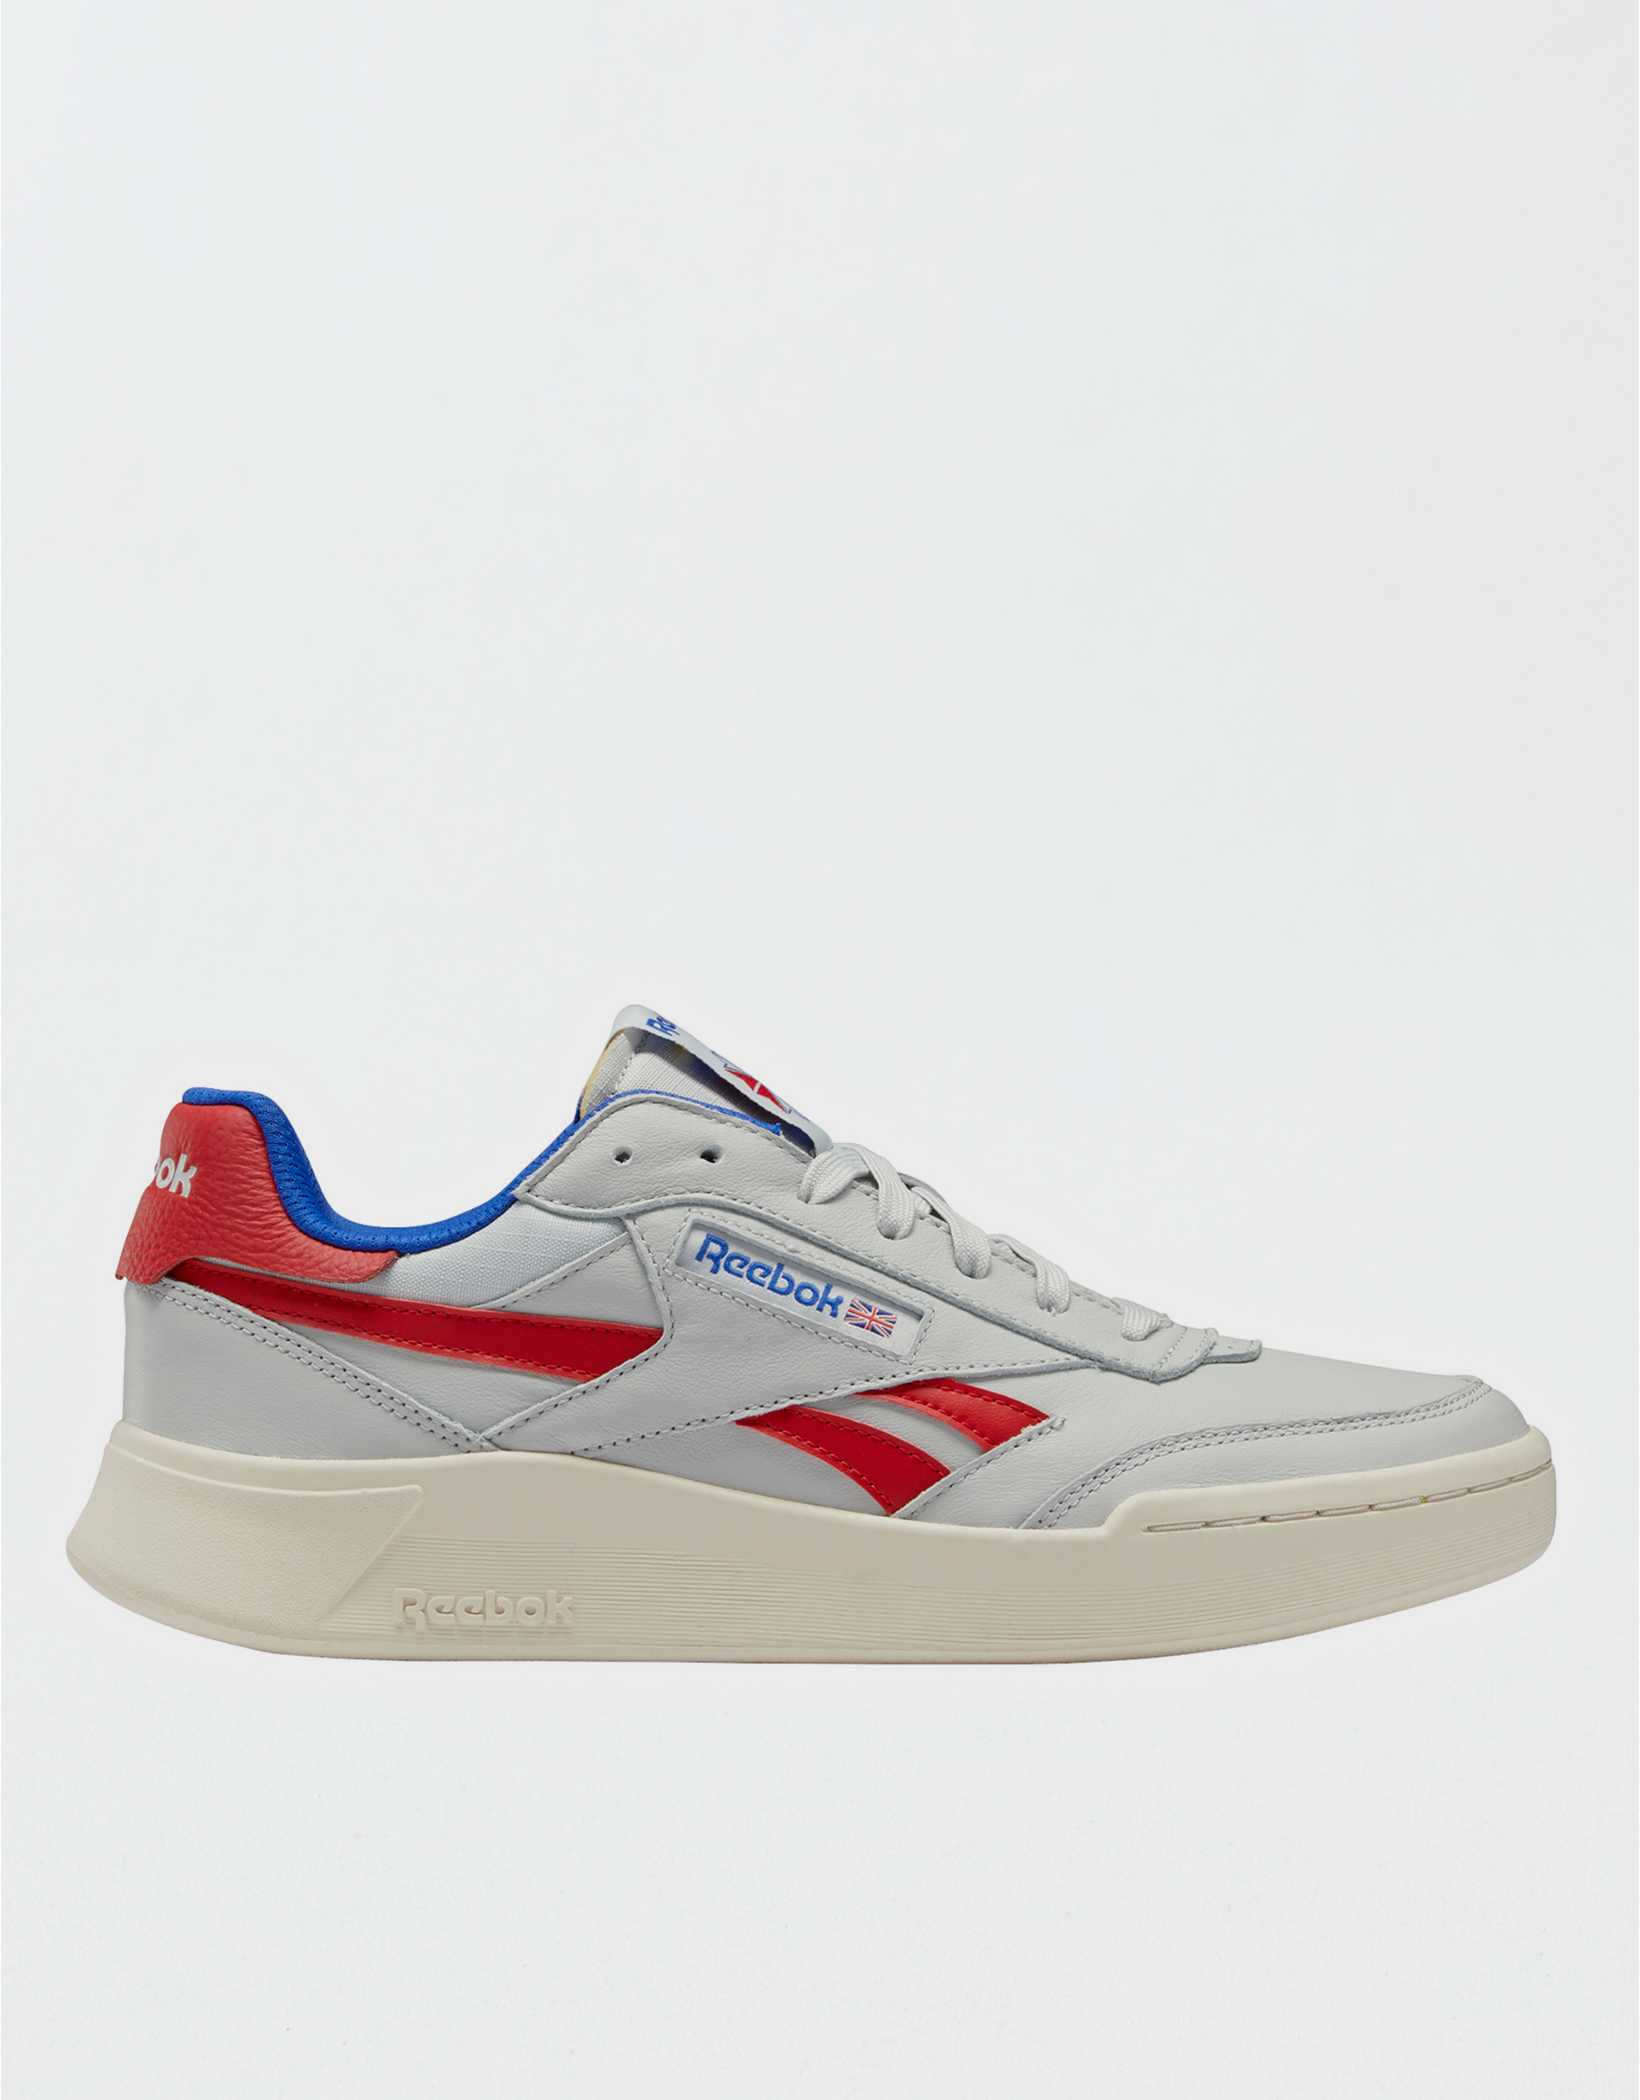 Reebok Men's Club C Legacy Revenge Sneaker